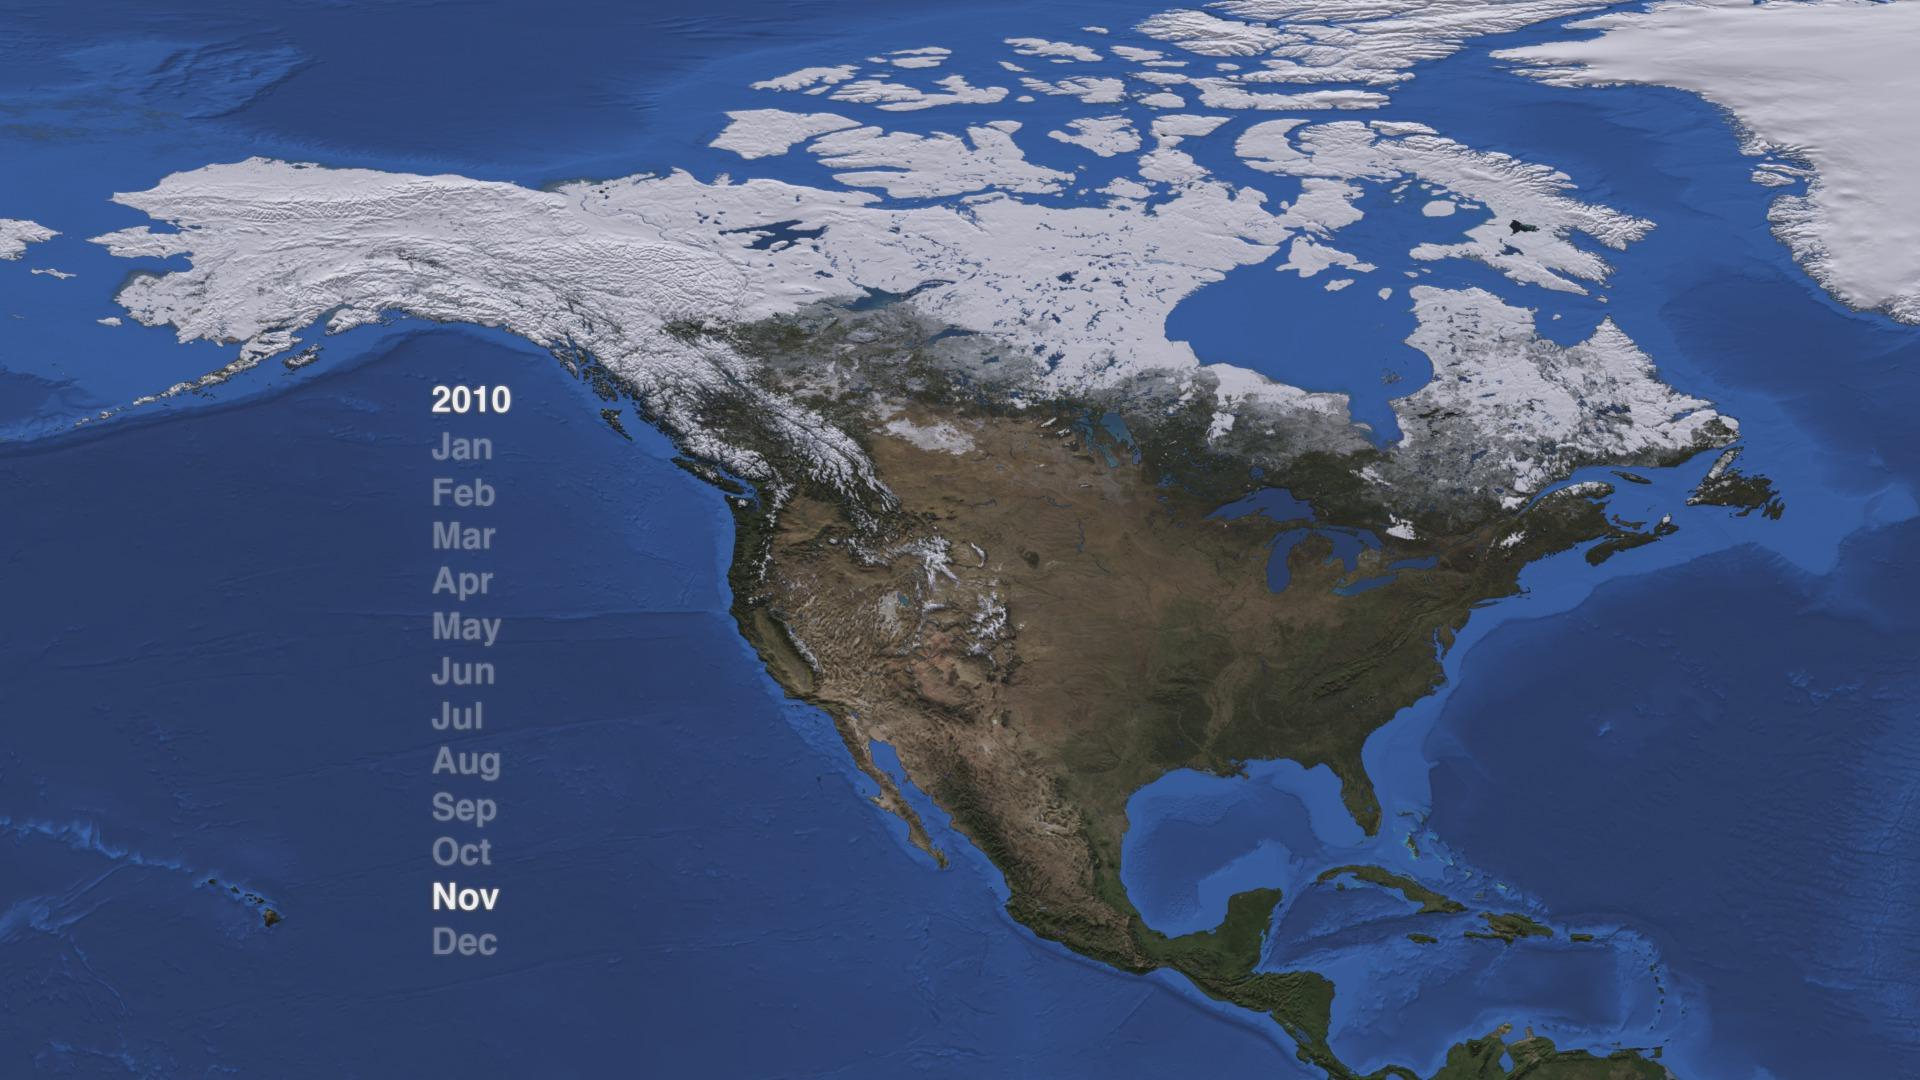 SVS North America Snow Cover 2009 2012